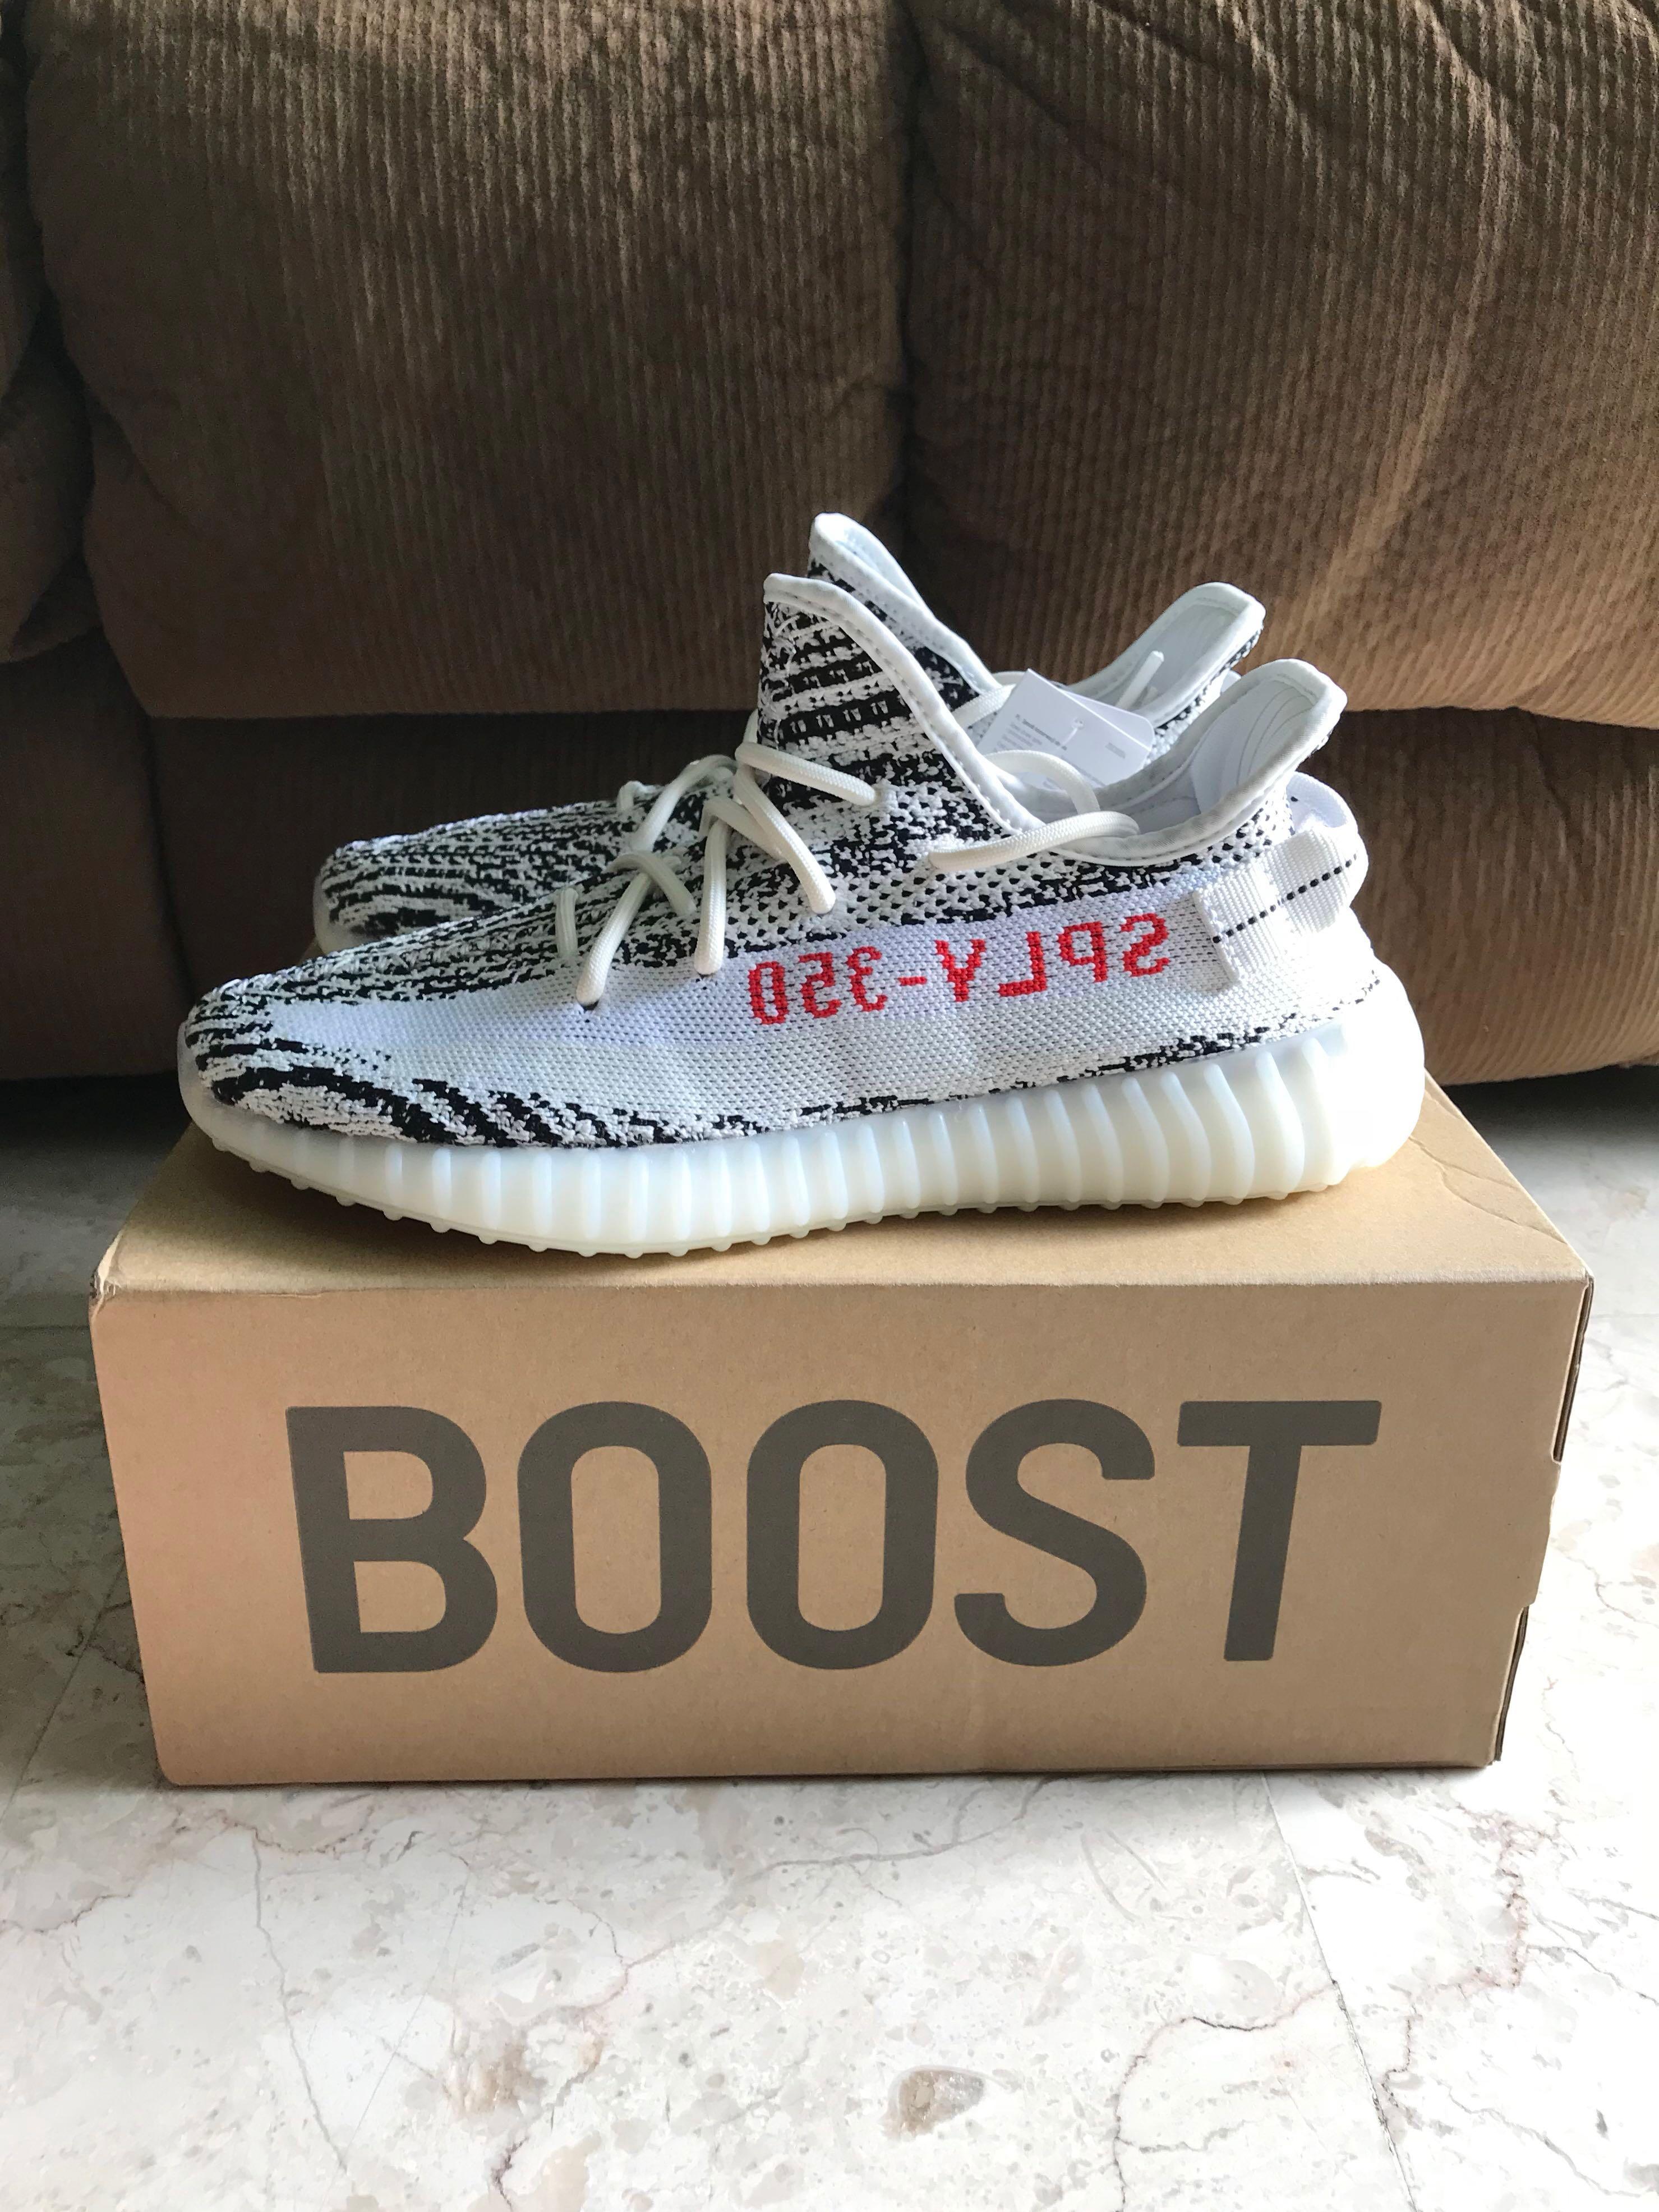 3476a0e06afa0 US 8.5 Adidas Yeezy Boost 350 V2 Zebra